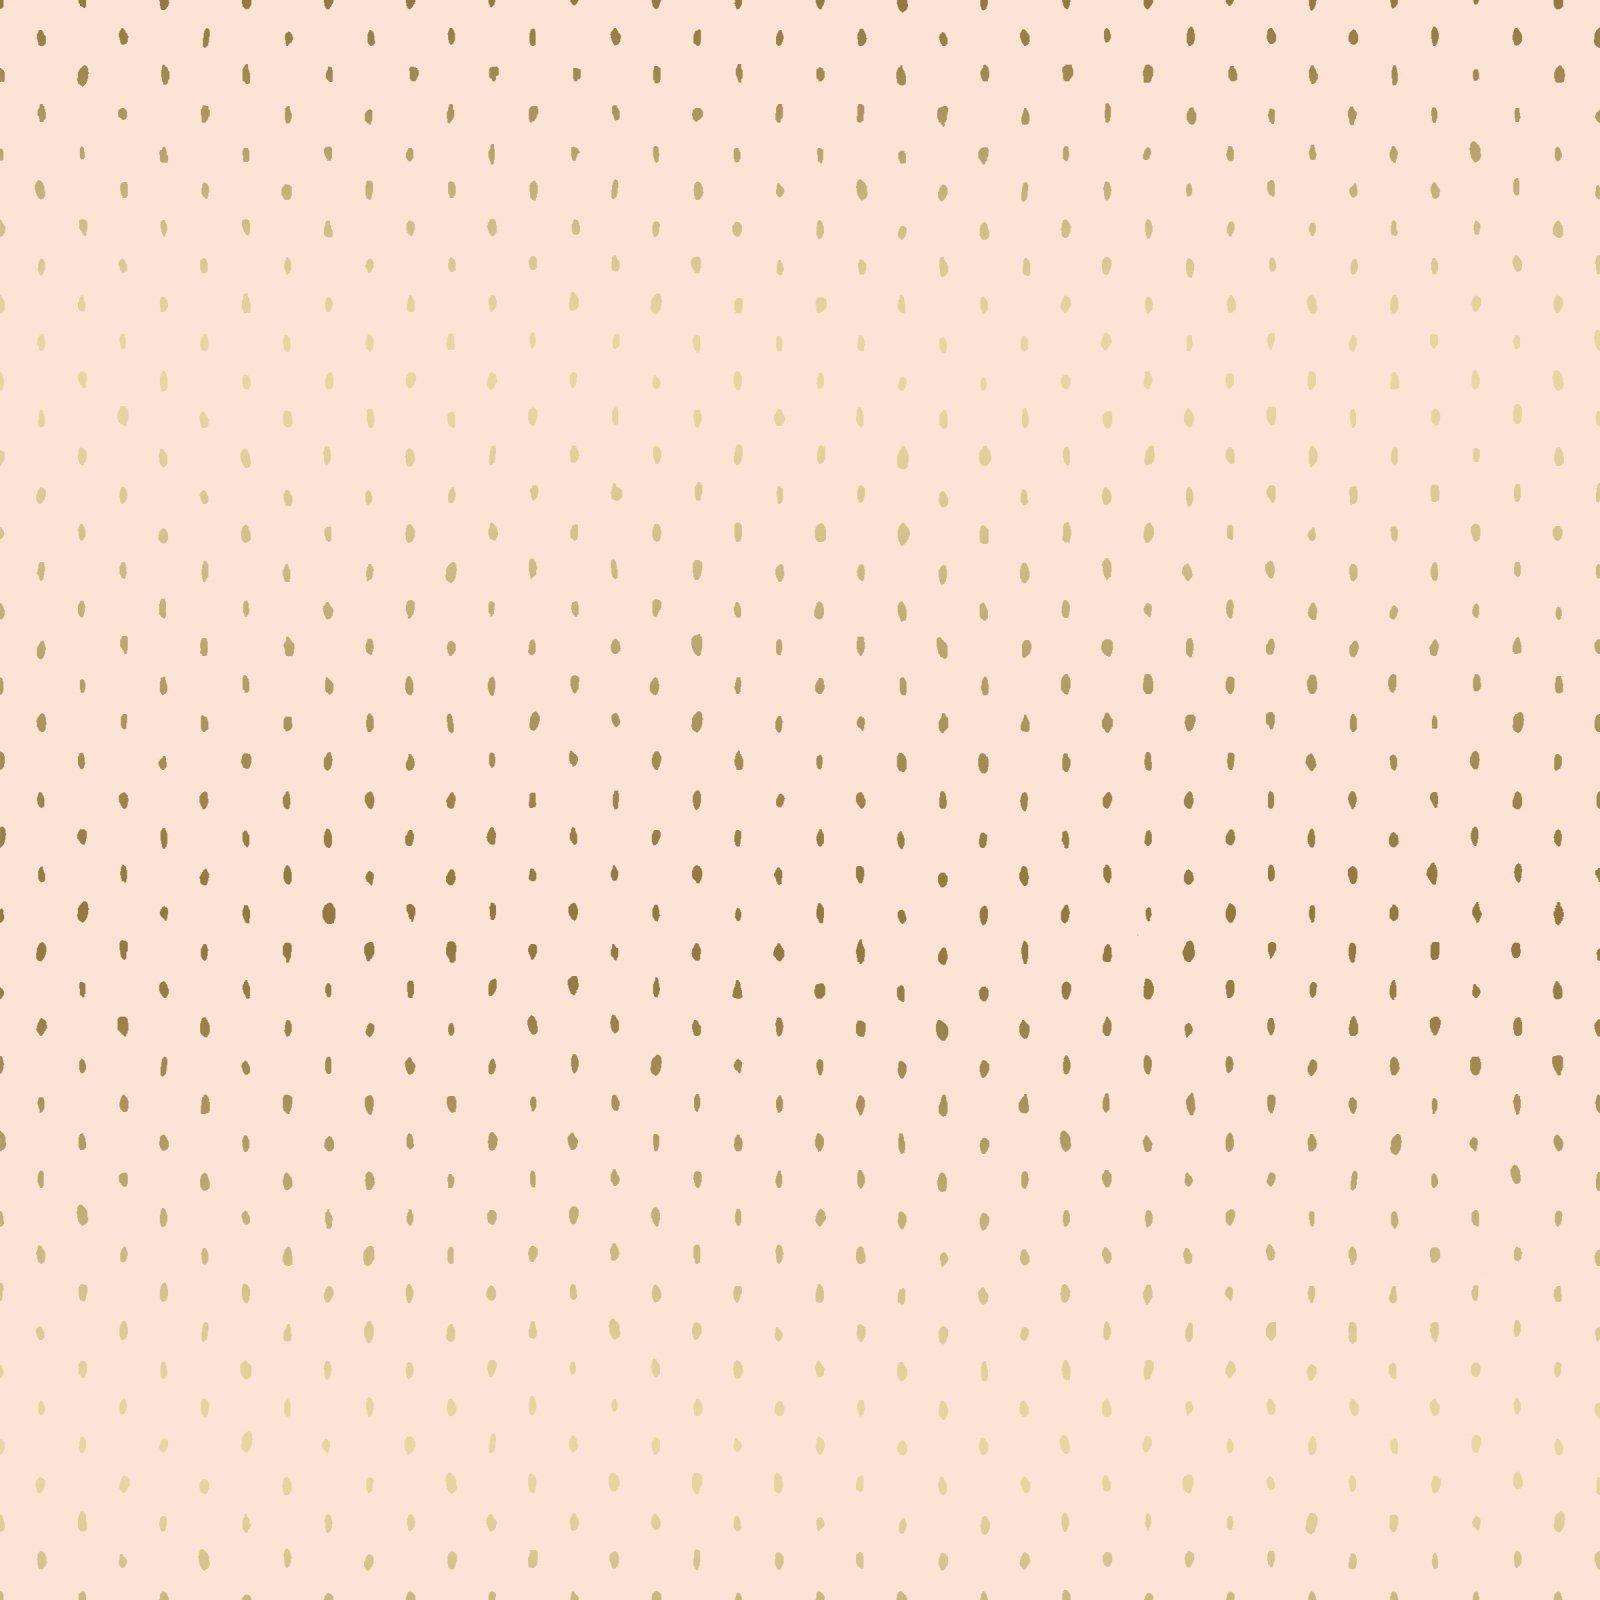 Stitch and Repeat - Blush Metallic